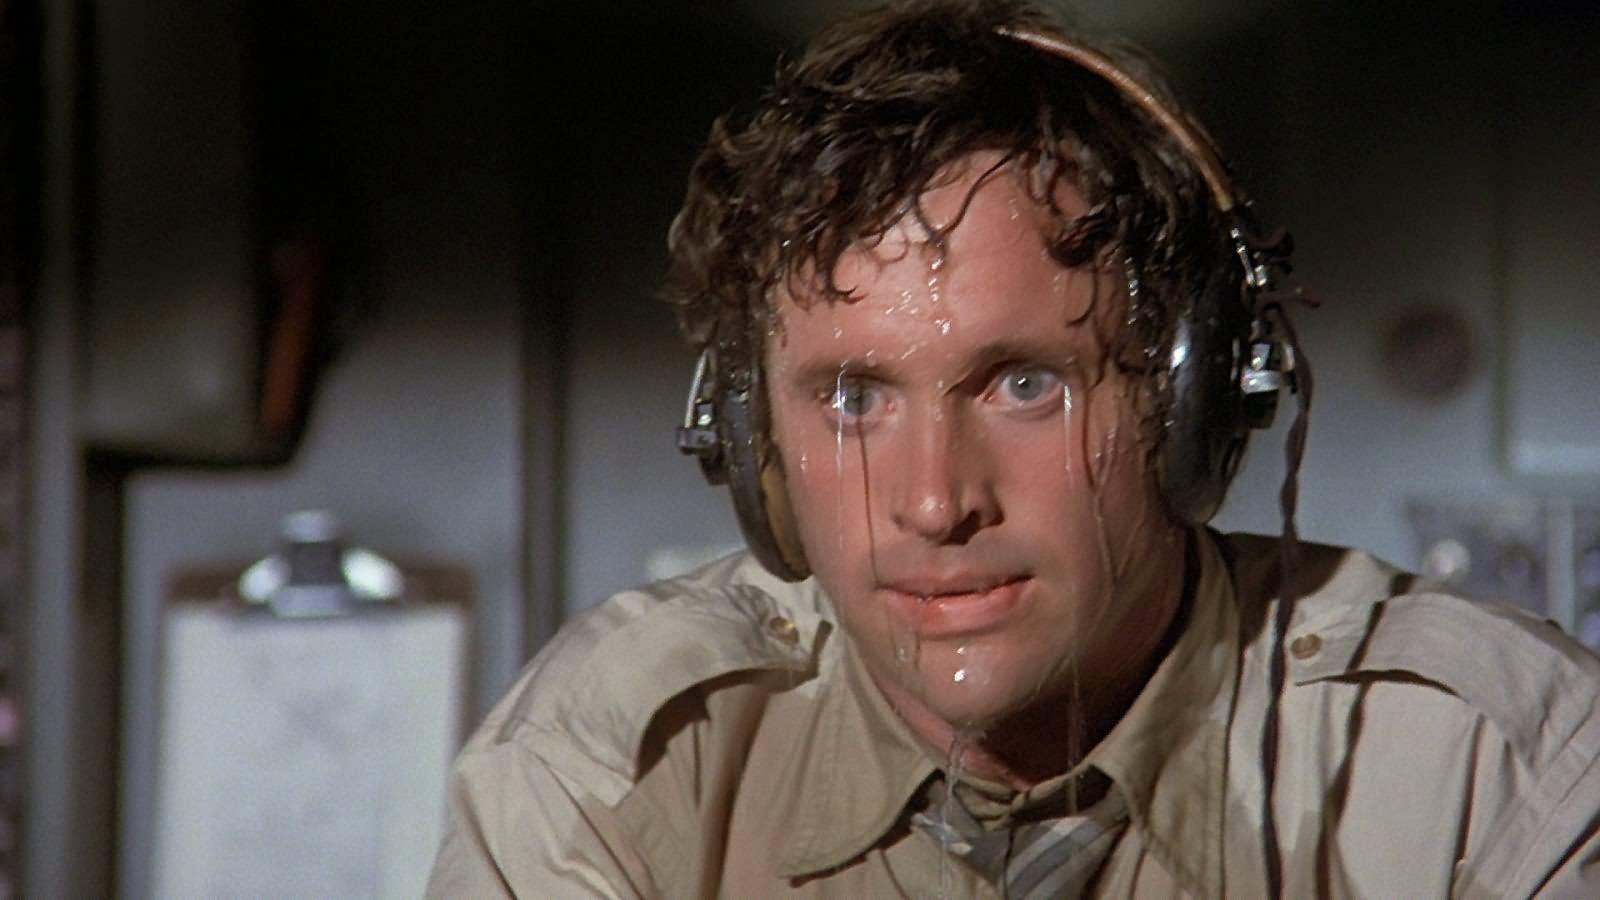 Funny-Sweating-Man-Image